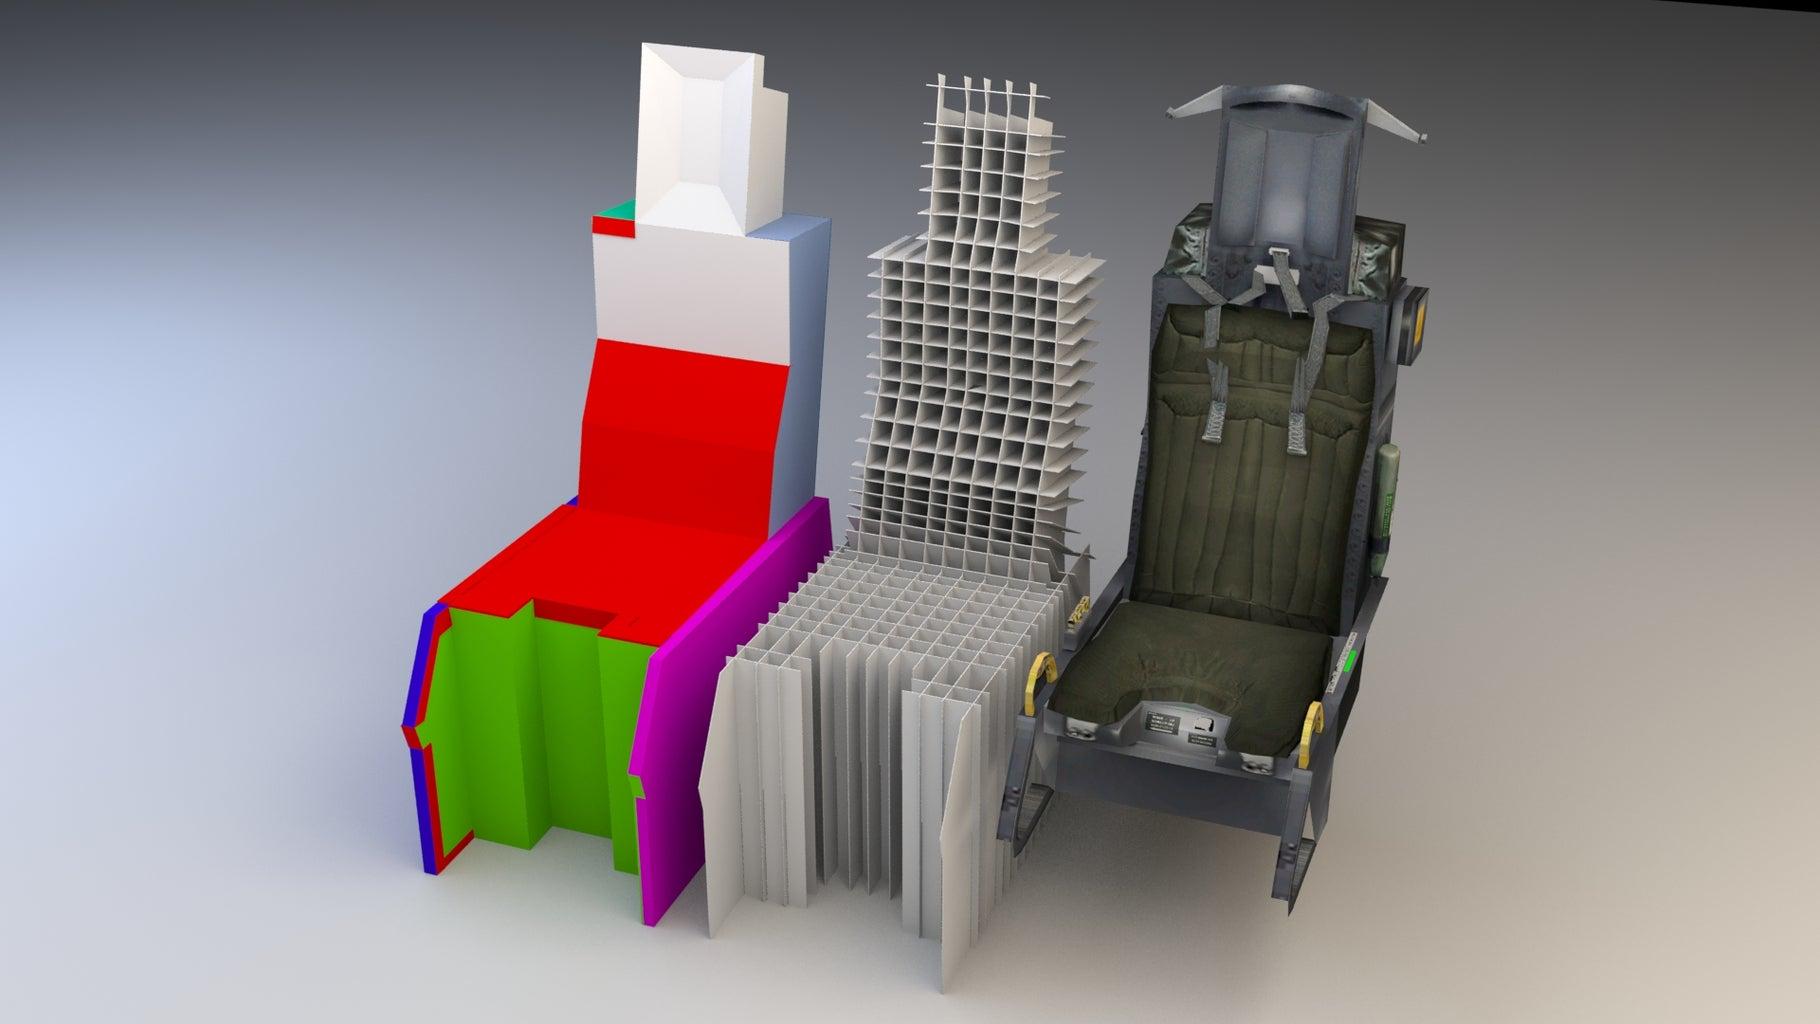 3D Modeling and Preparing Mesh